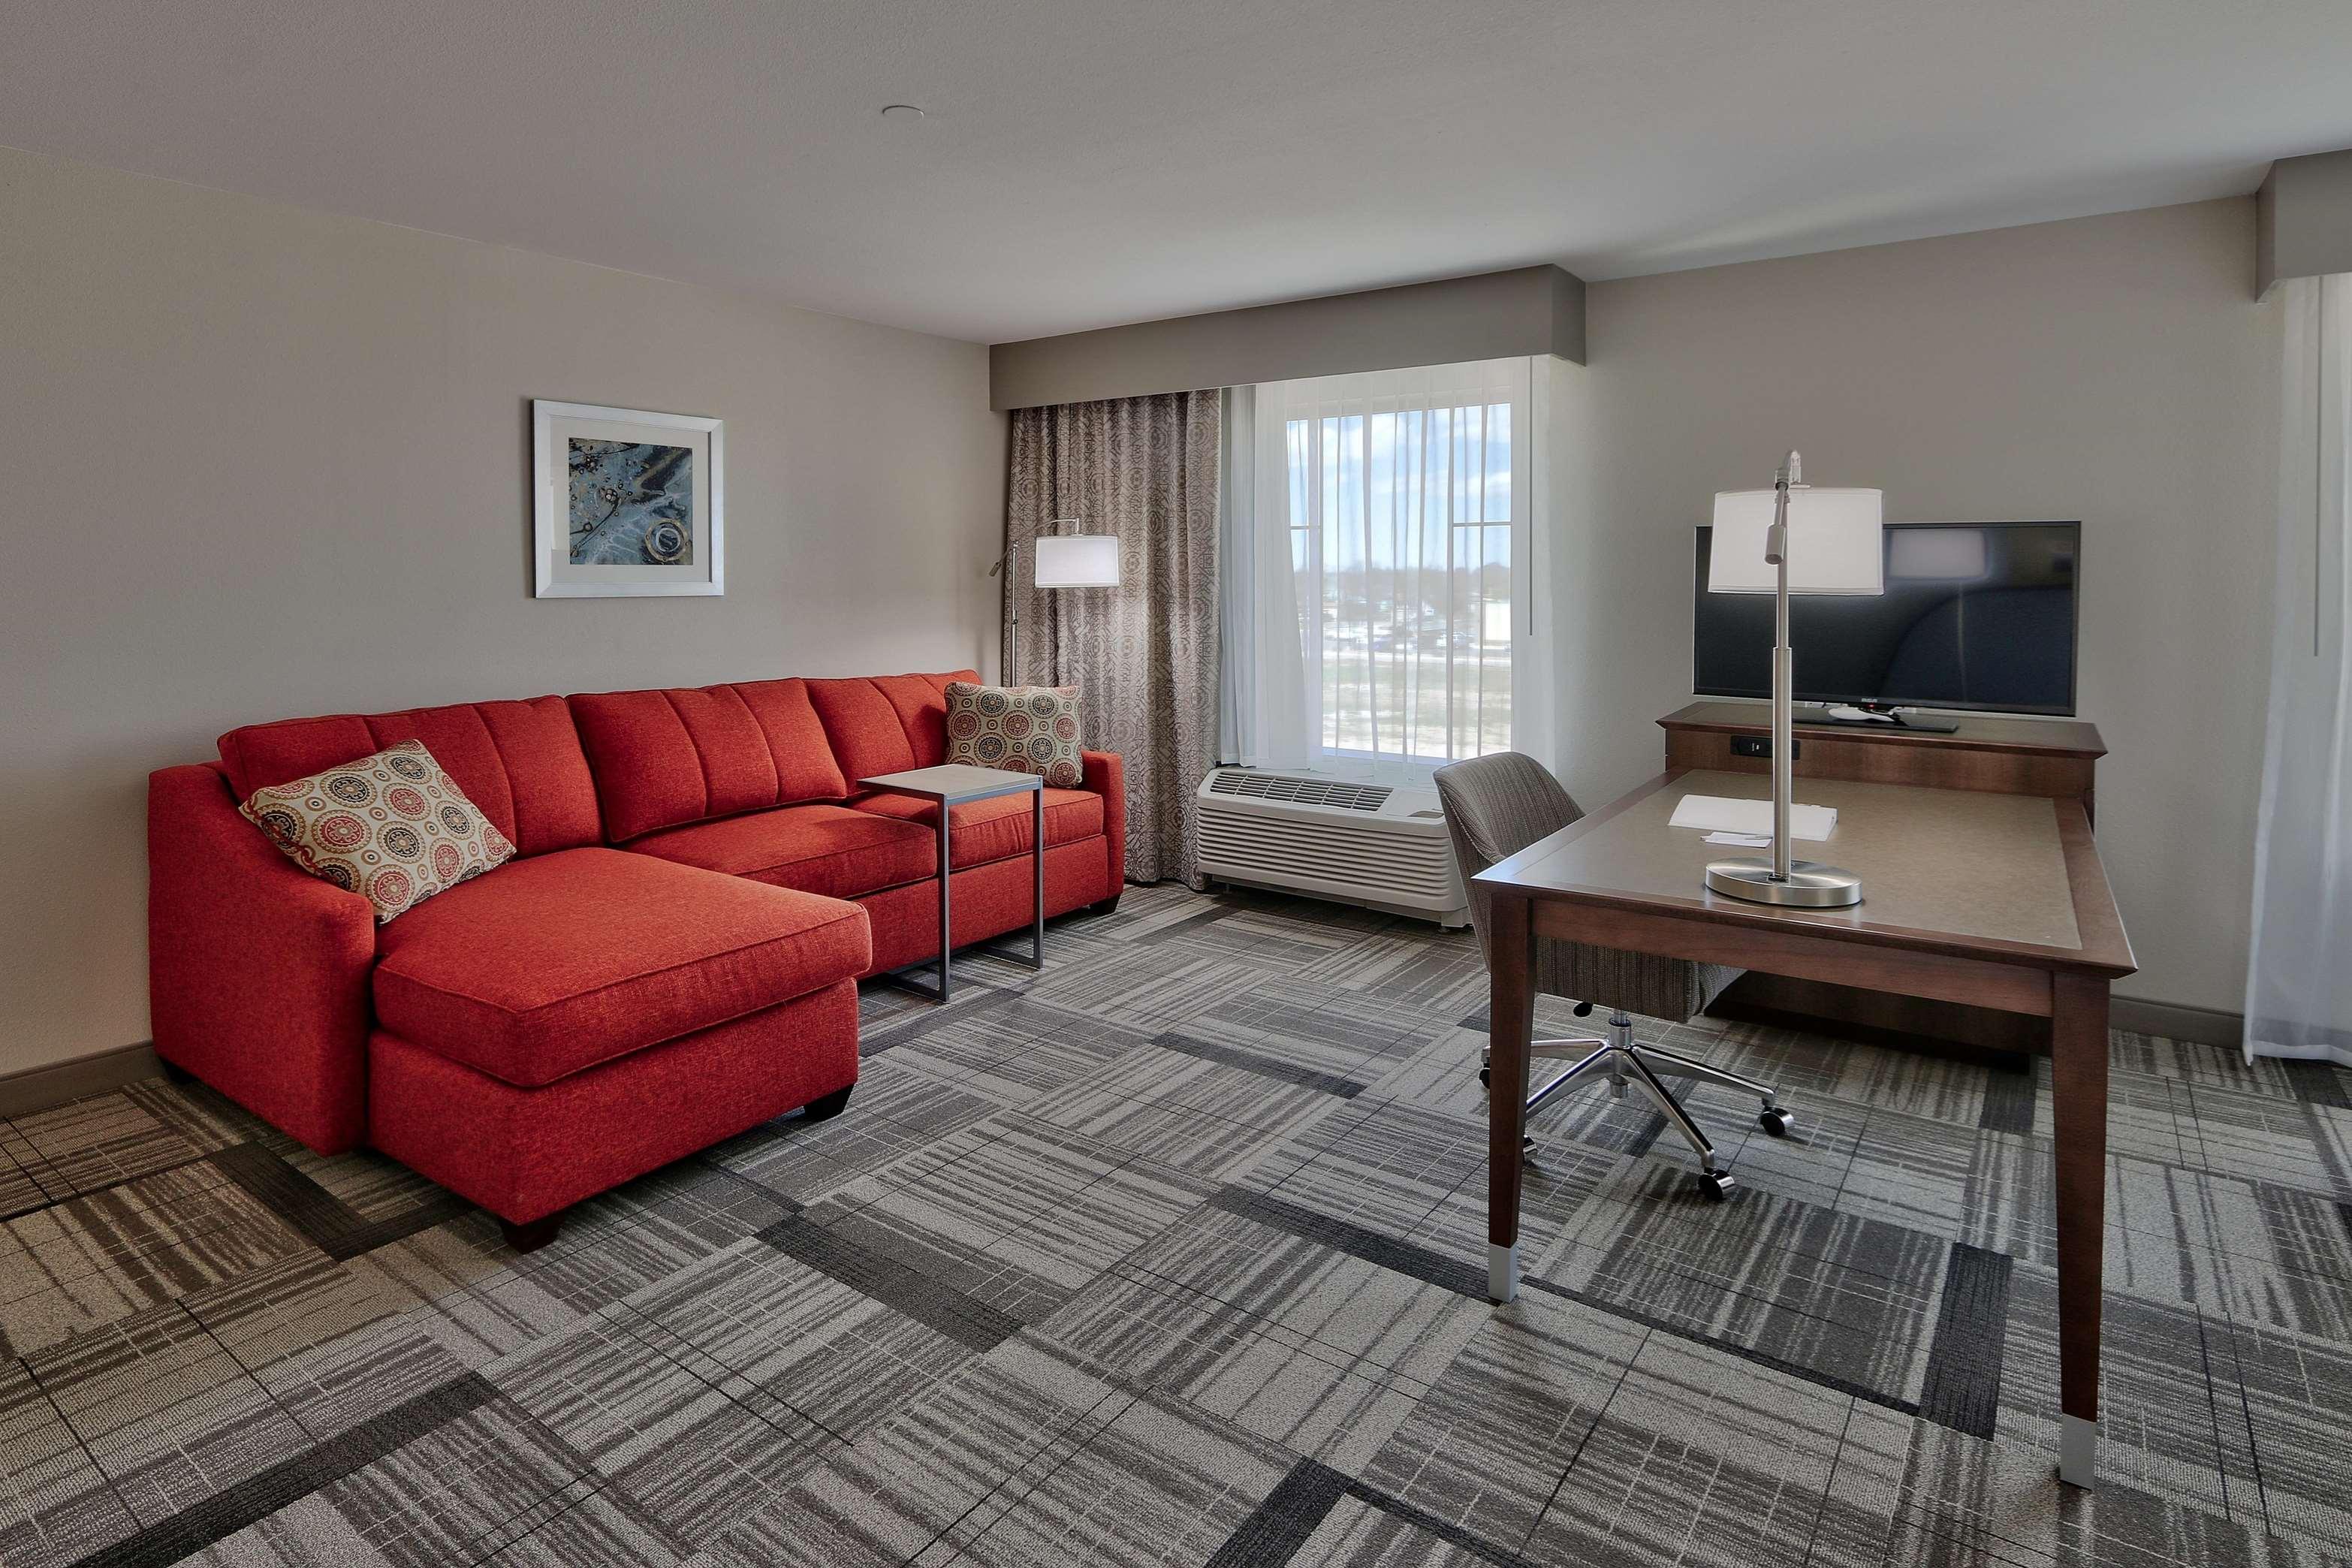 Hampton Inn & Suites Artesia image 10